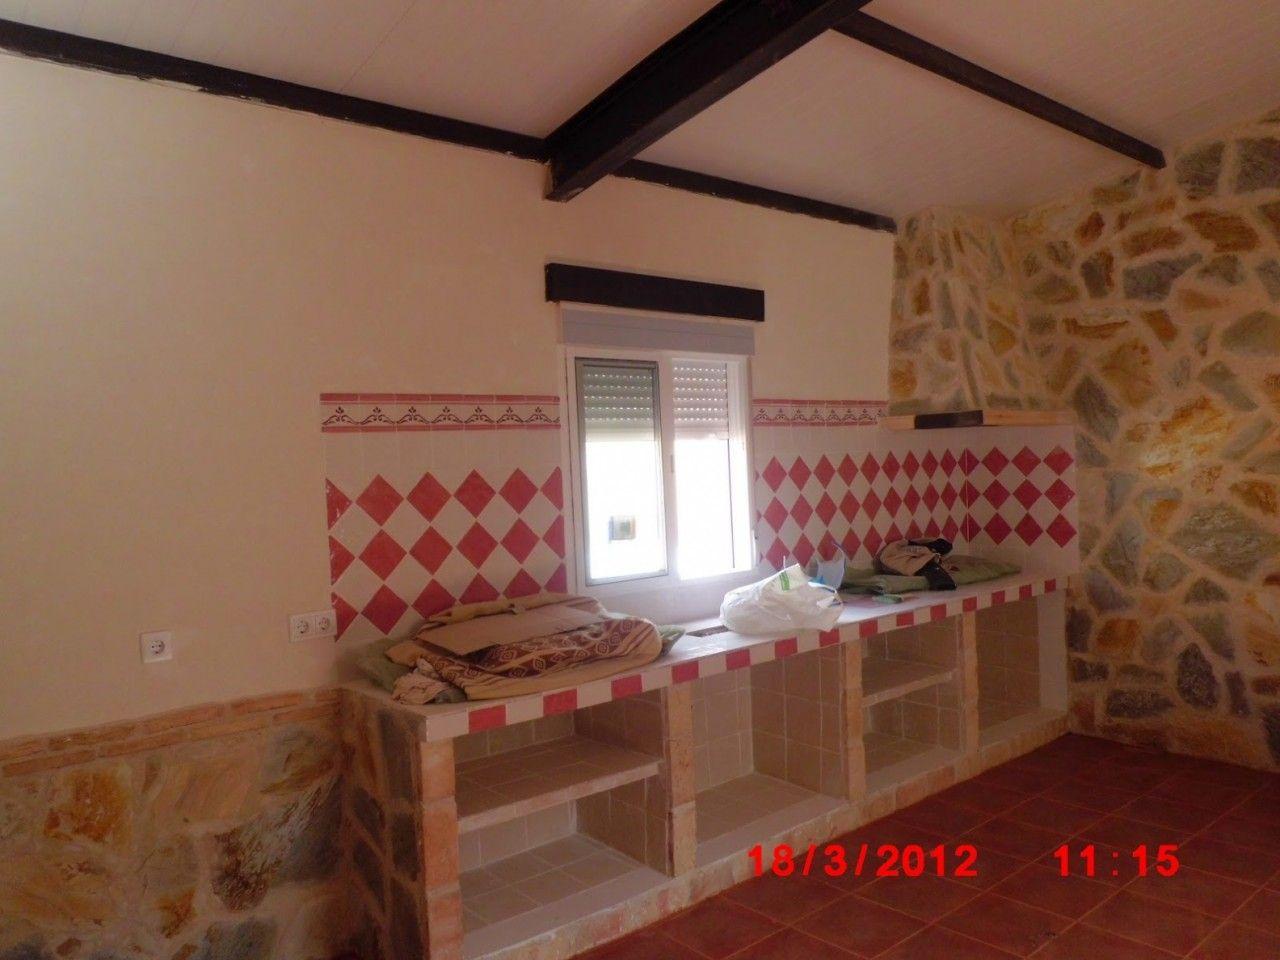 Pin By Tata Ramirez On Decoracion Cocinas Rusticas Modernas Cool Kitchens Home Decor